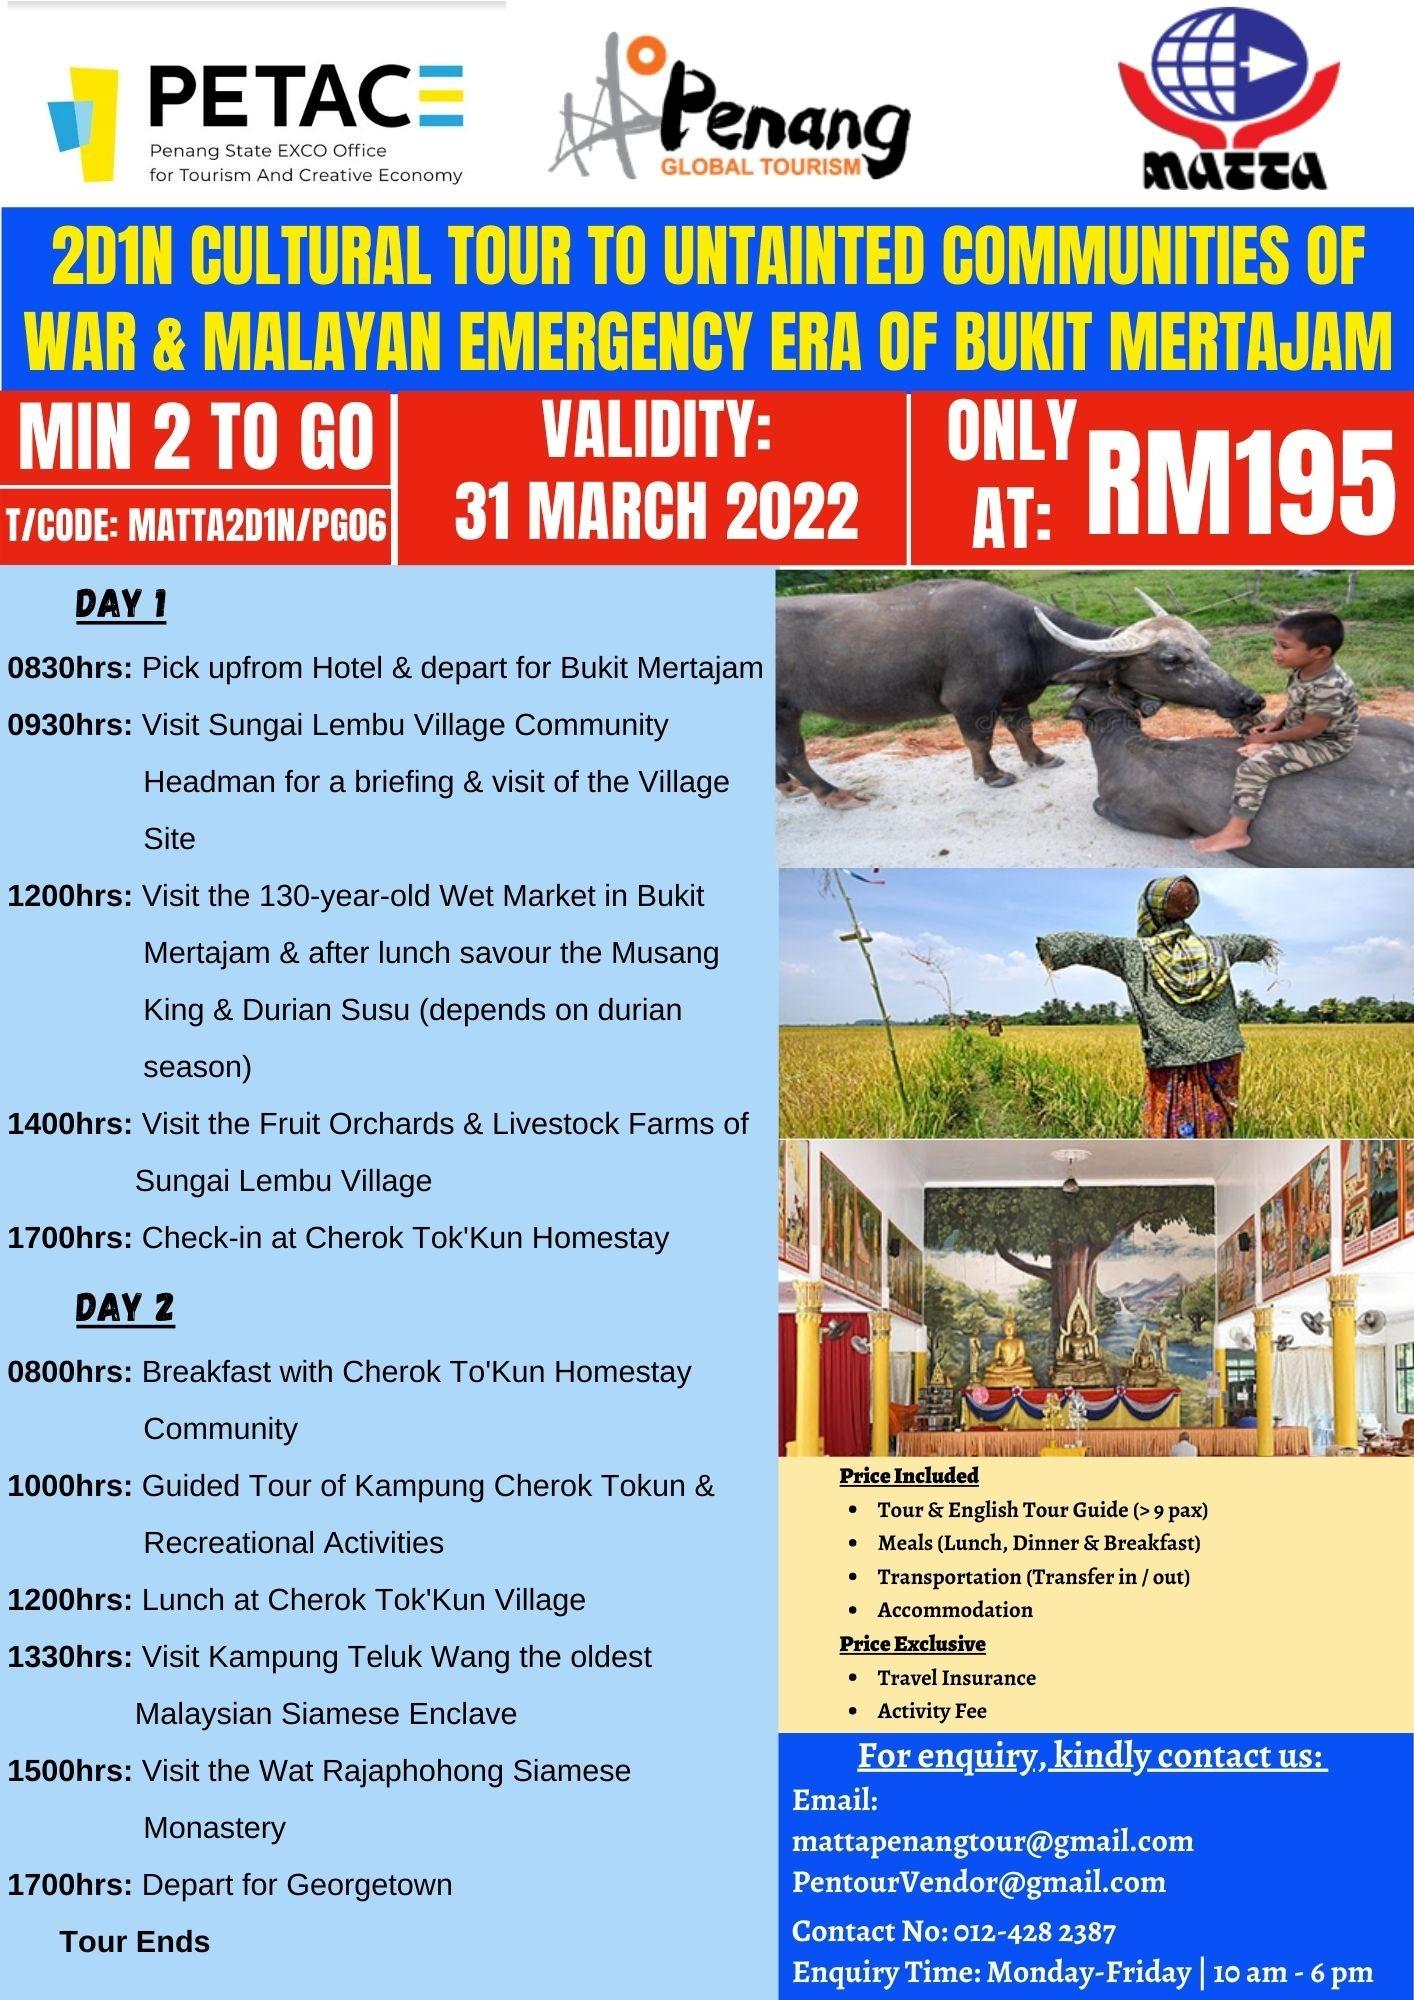 2D1N Cultural Tour to Untainted Communities of War & Malayan Emergency Era of Bukit Mertajam